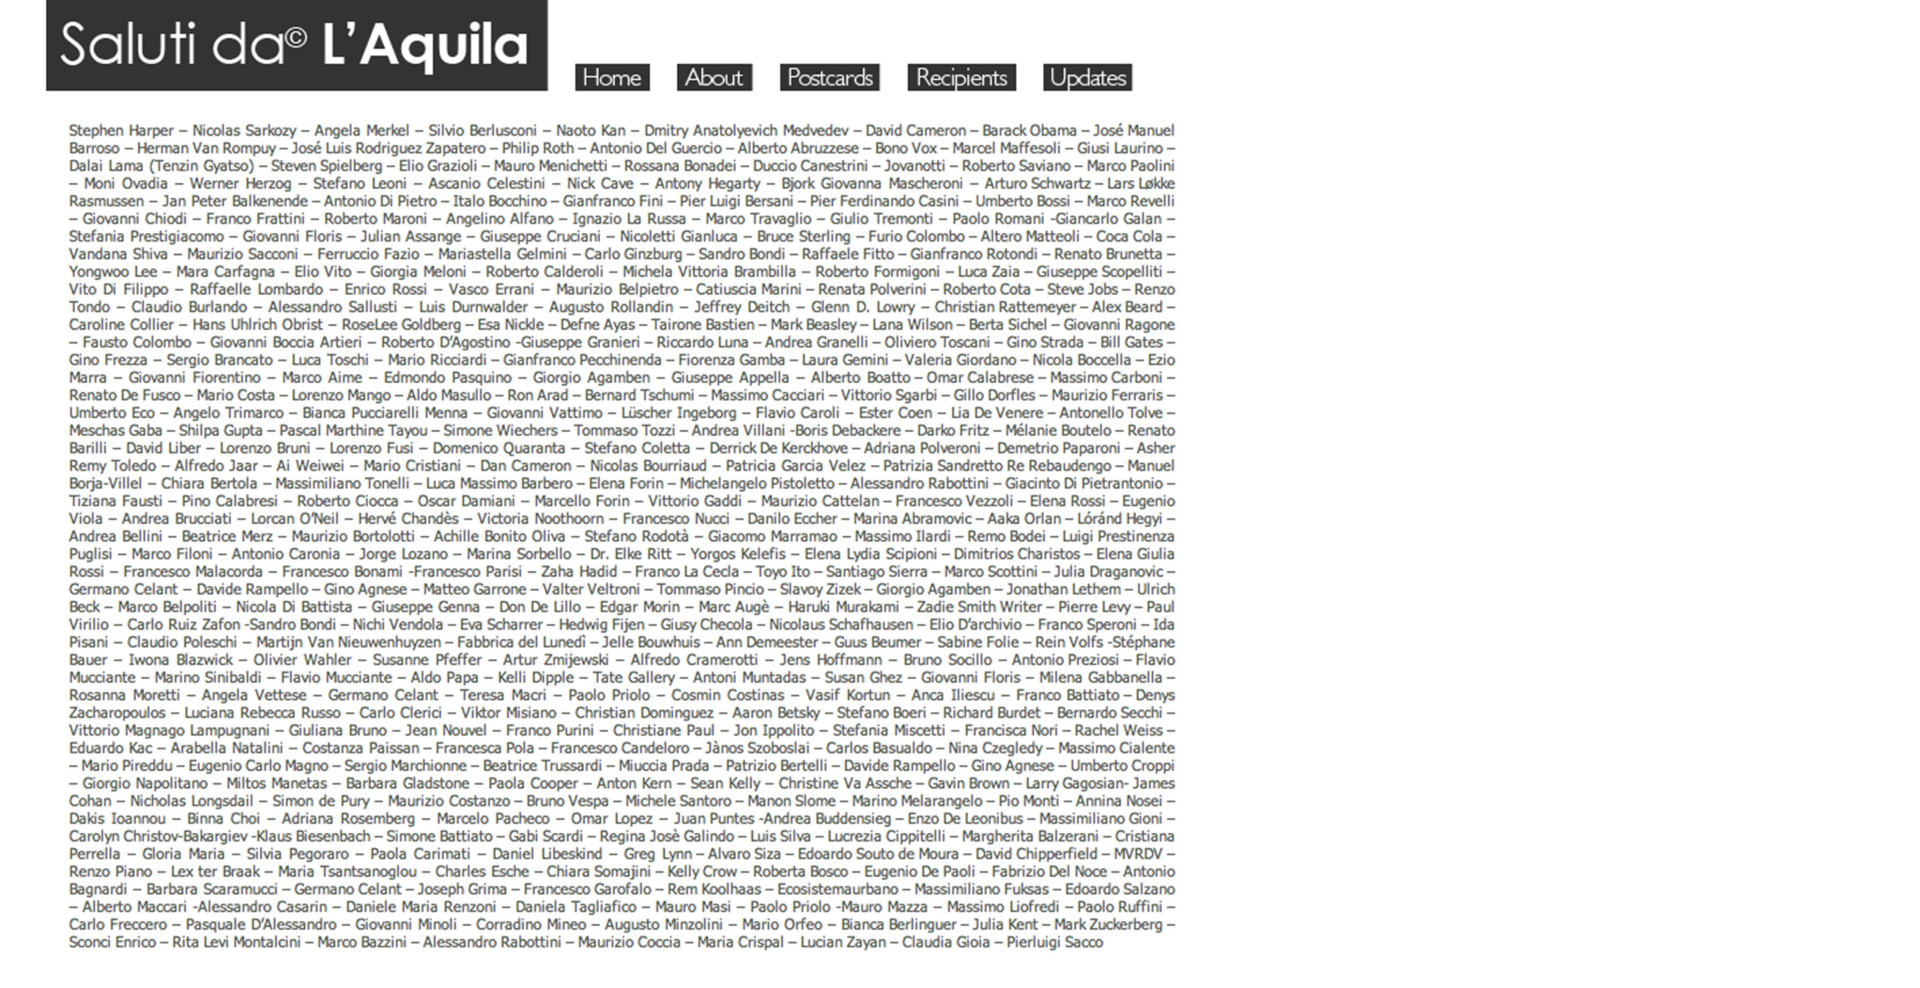 Saluti da L'Aquila schermata8_bassa